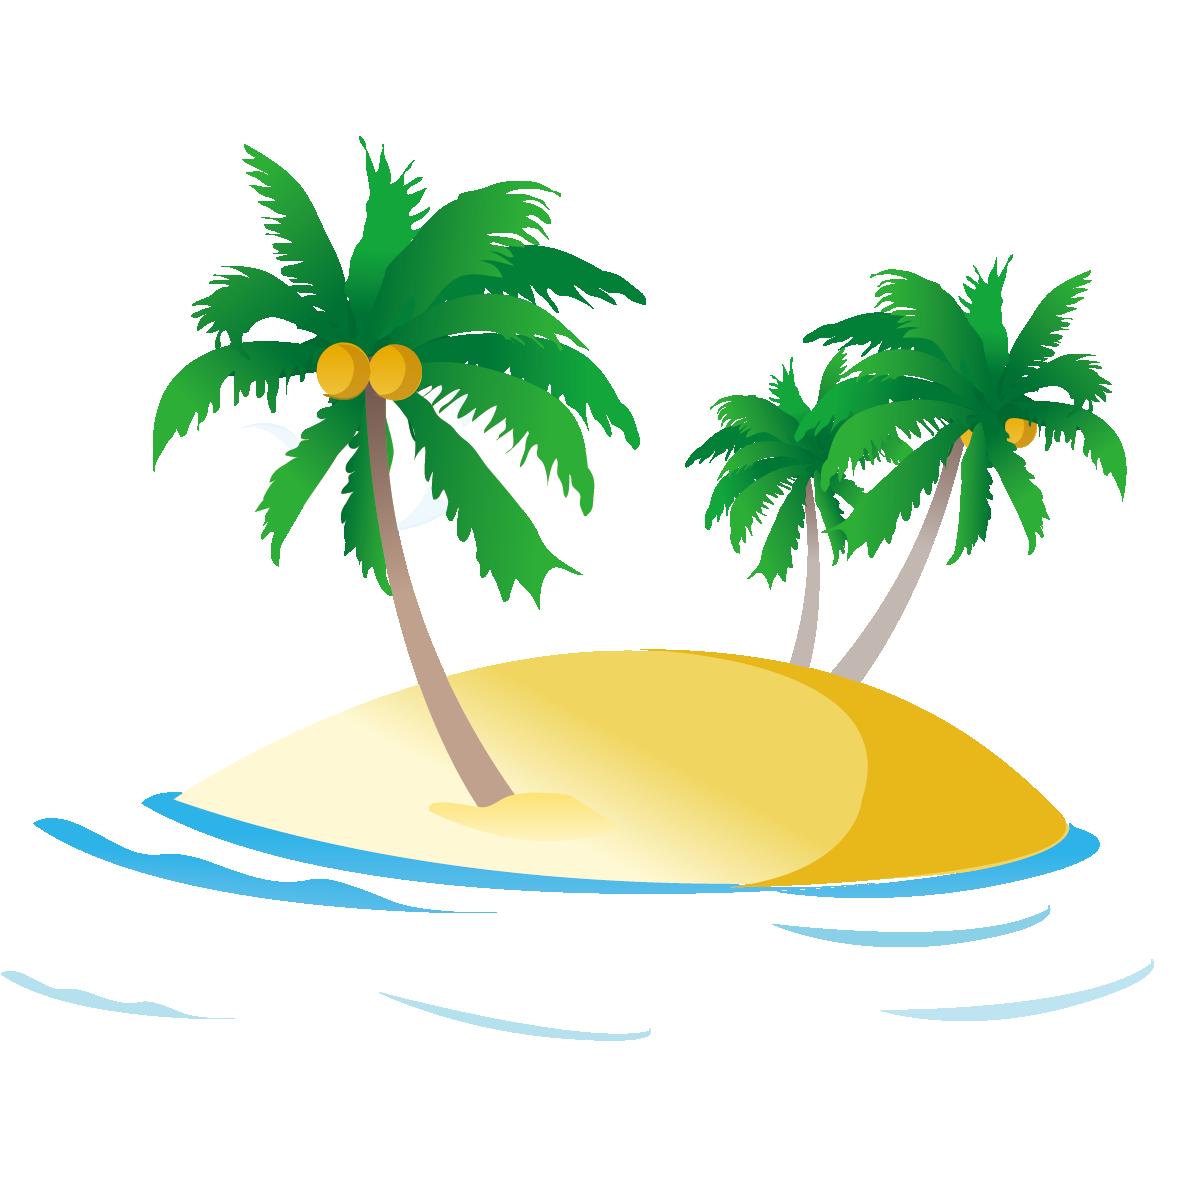 Free clipart palm tree beach clip art free stock Sea Ocean Royalty-free Clip art - Beach coconut tree 1181*1181 ... clip art free stock